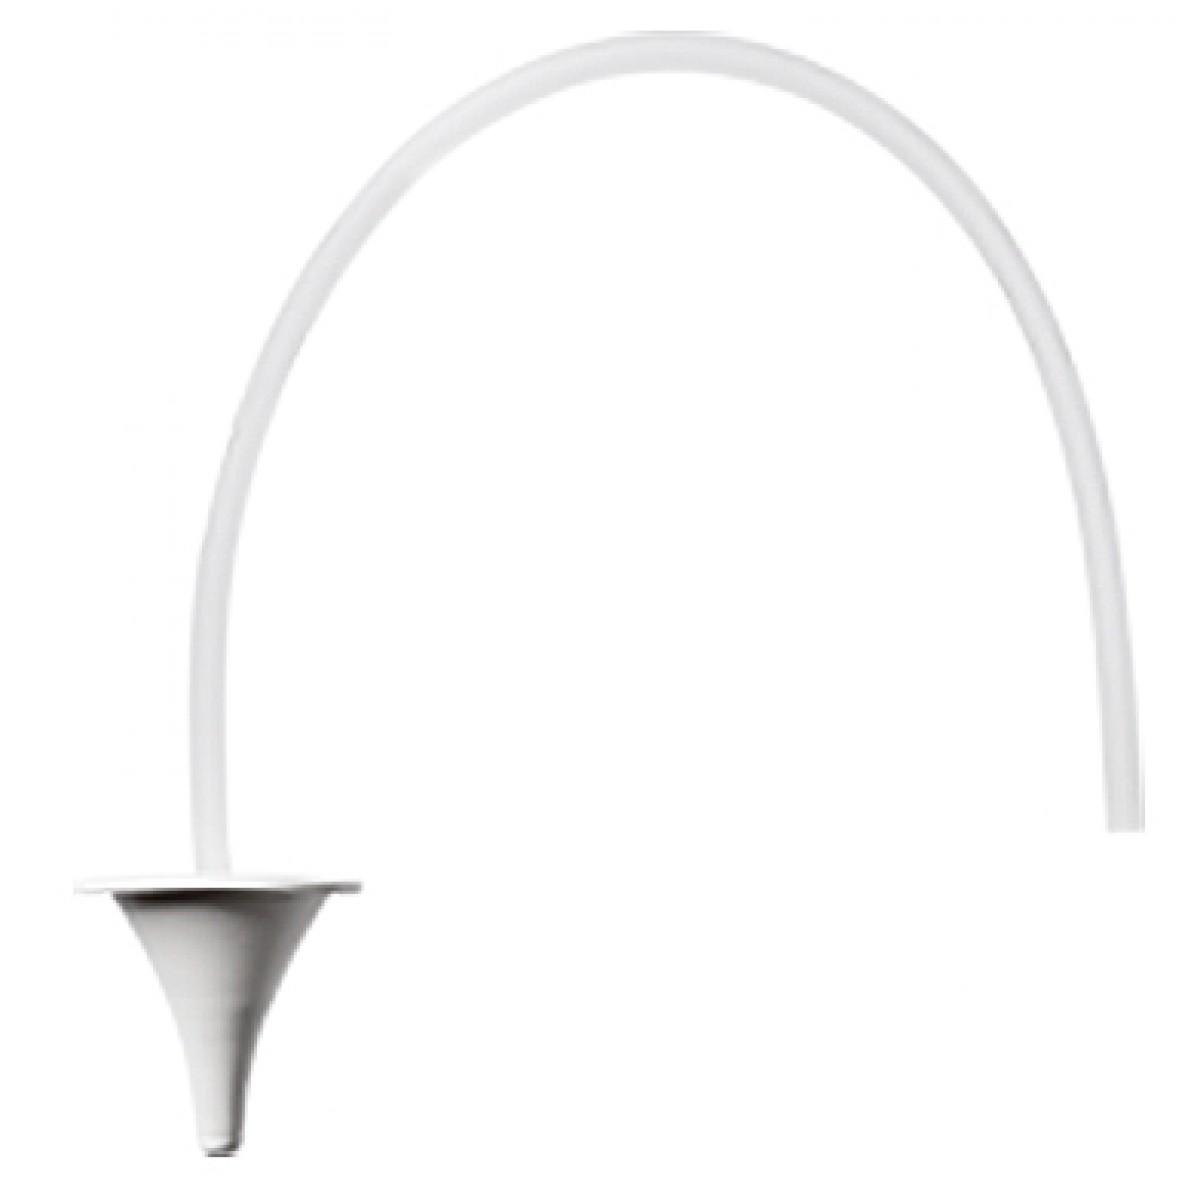 Sistema Irrigação Colo Tip Branca Alterna 1110 - (Coloplast)